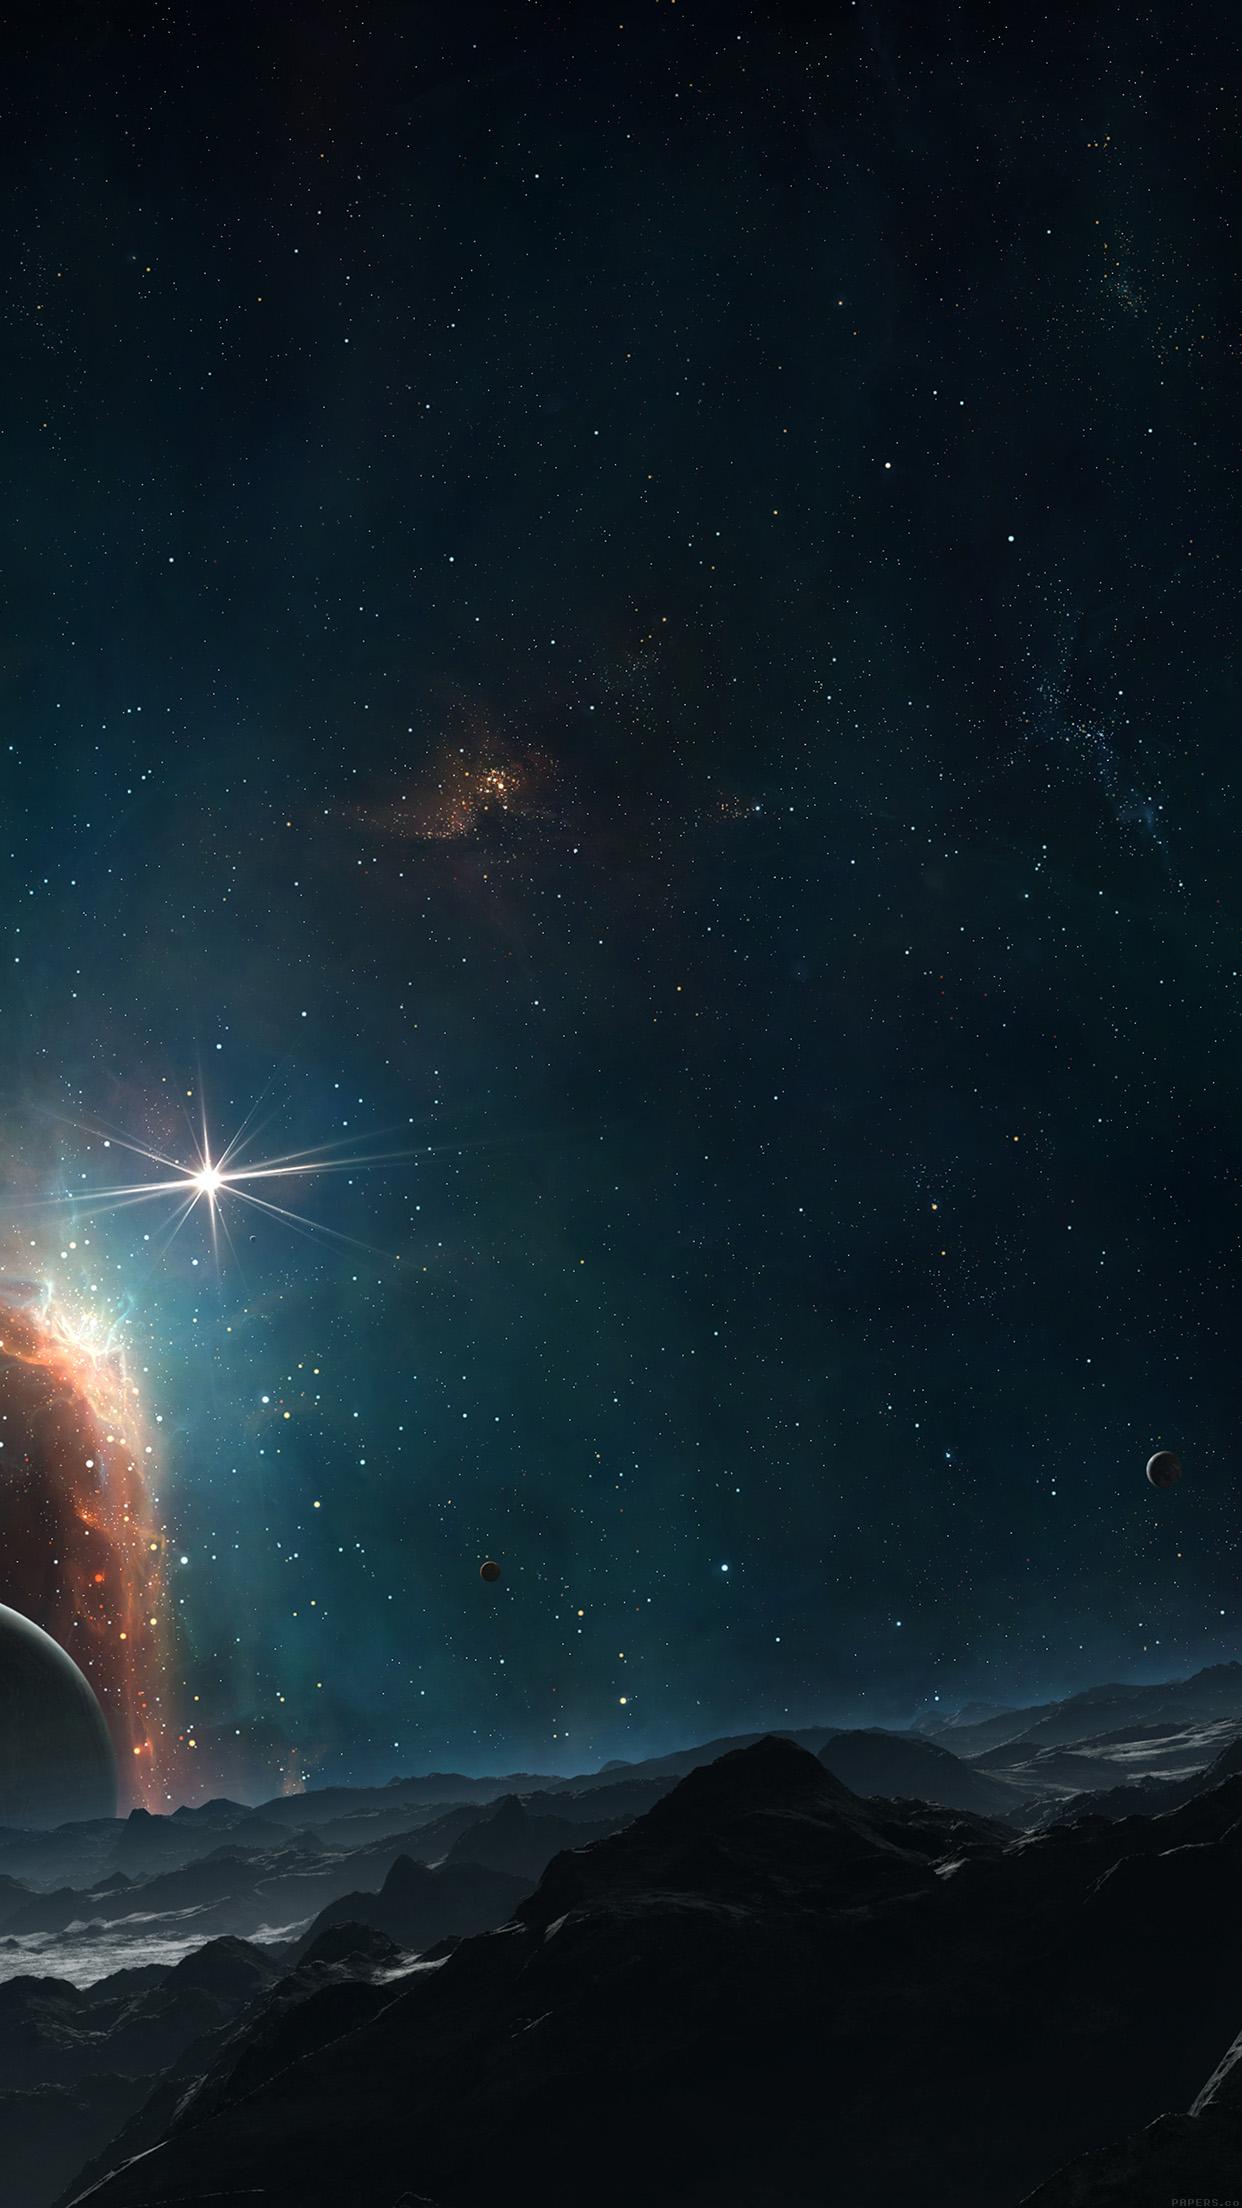 bellissime galassie per iPhone e iPadMeladevice Meladevice 1242x2208